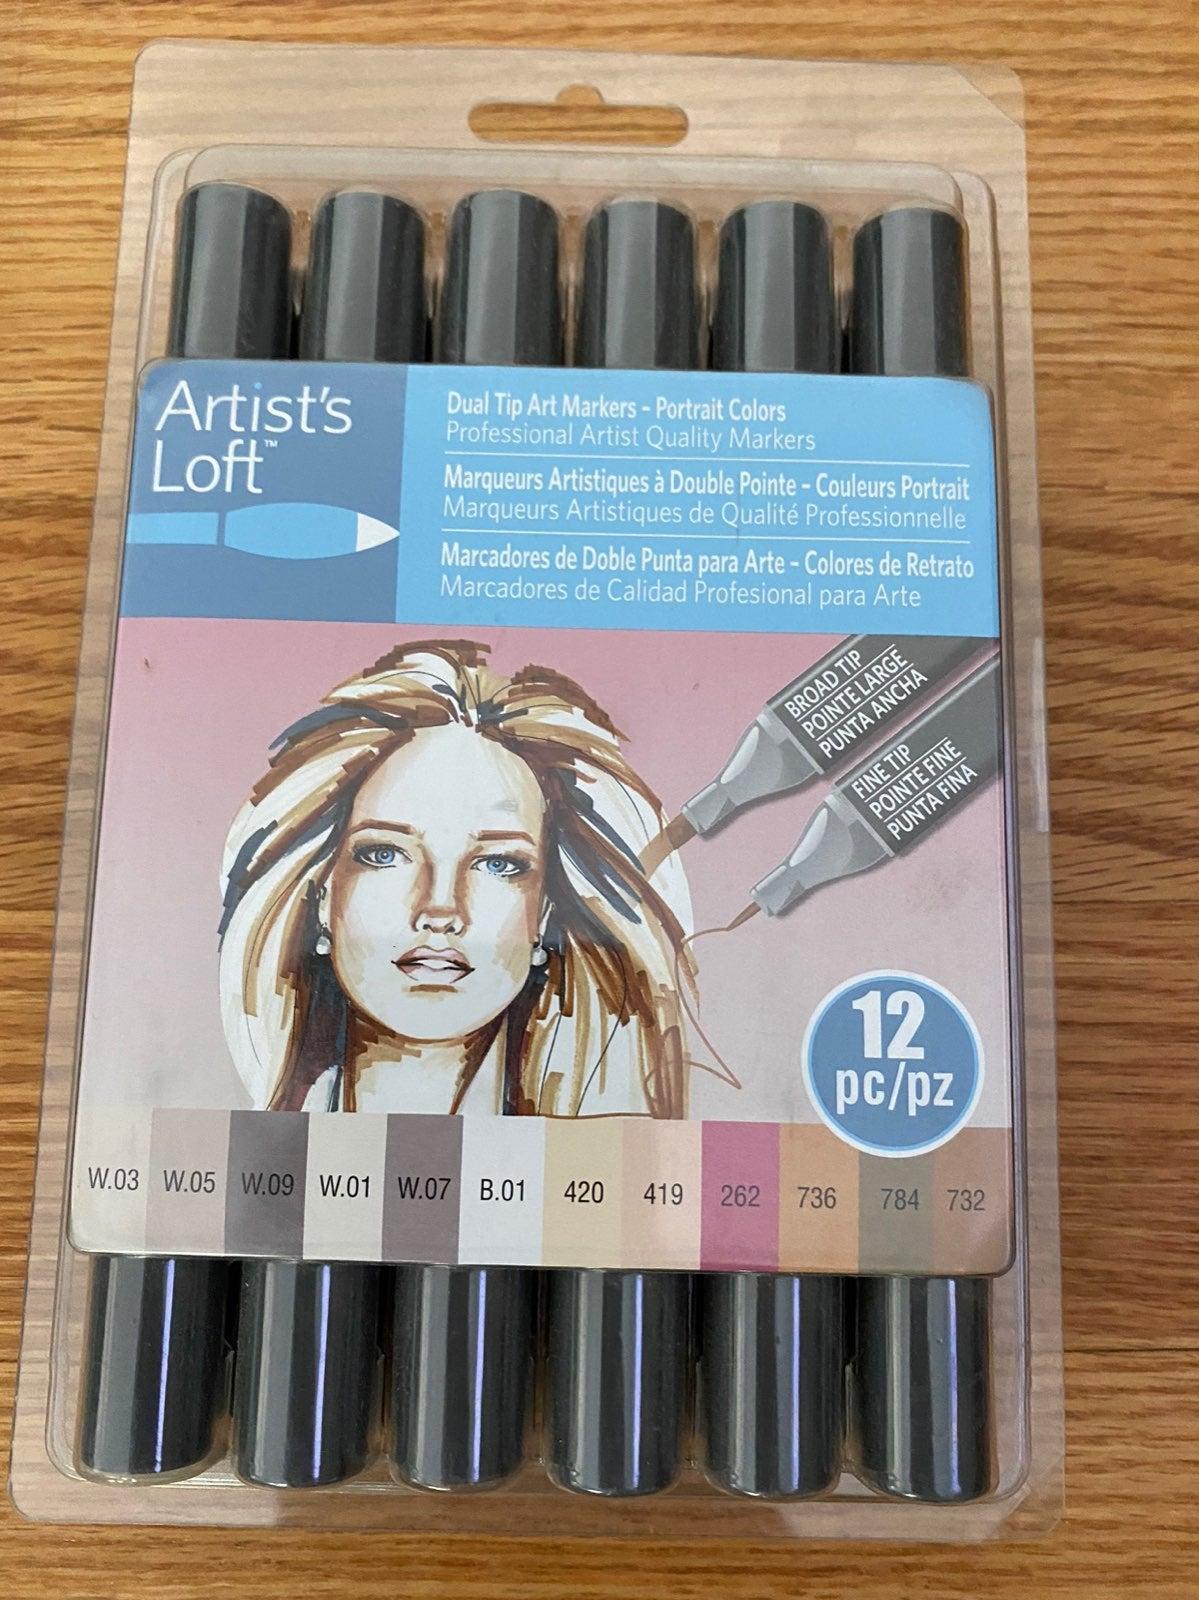 Duel tip art markers